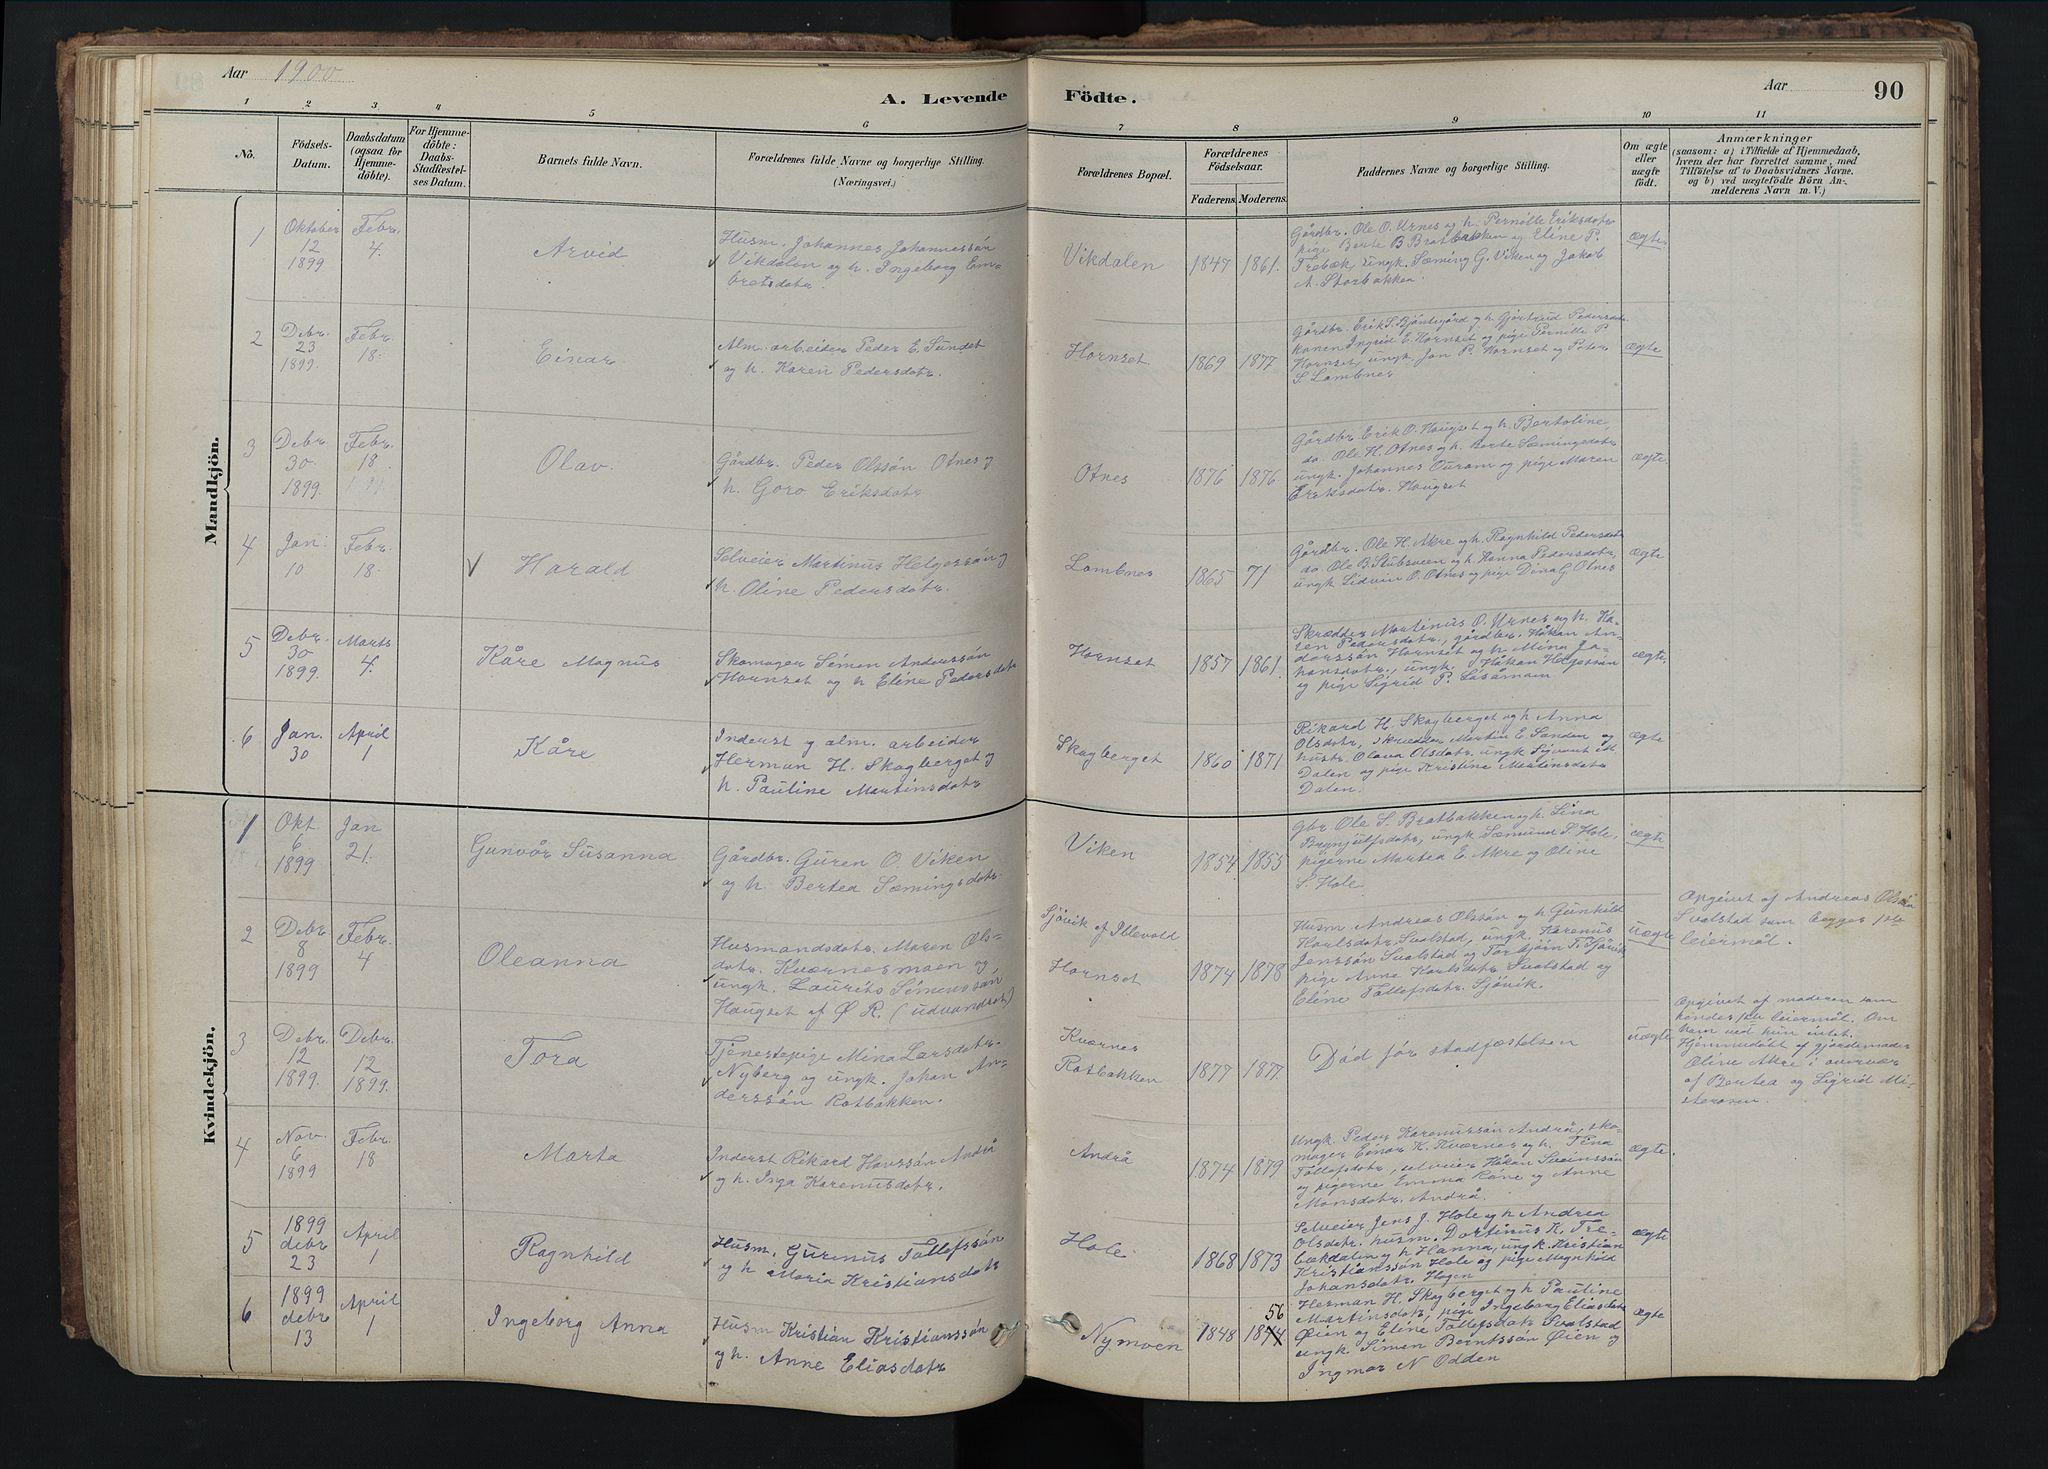 SAH, Rendalen prestekontor, H/Ha/Hab/L0009: Parish register (copy) no. 9, 1879-1902, p. 90